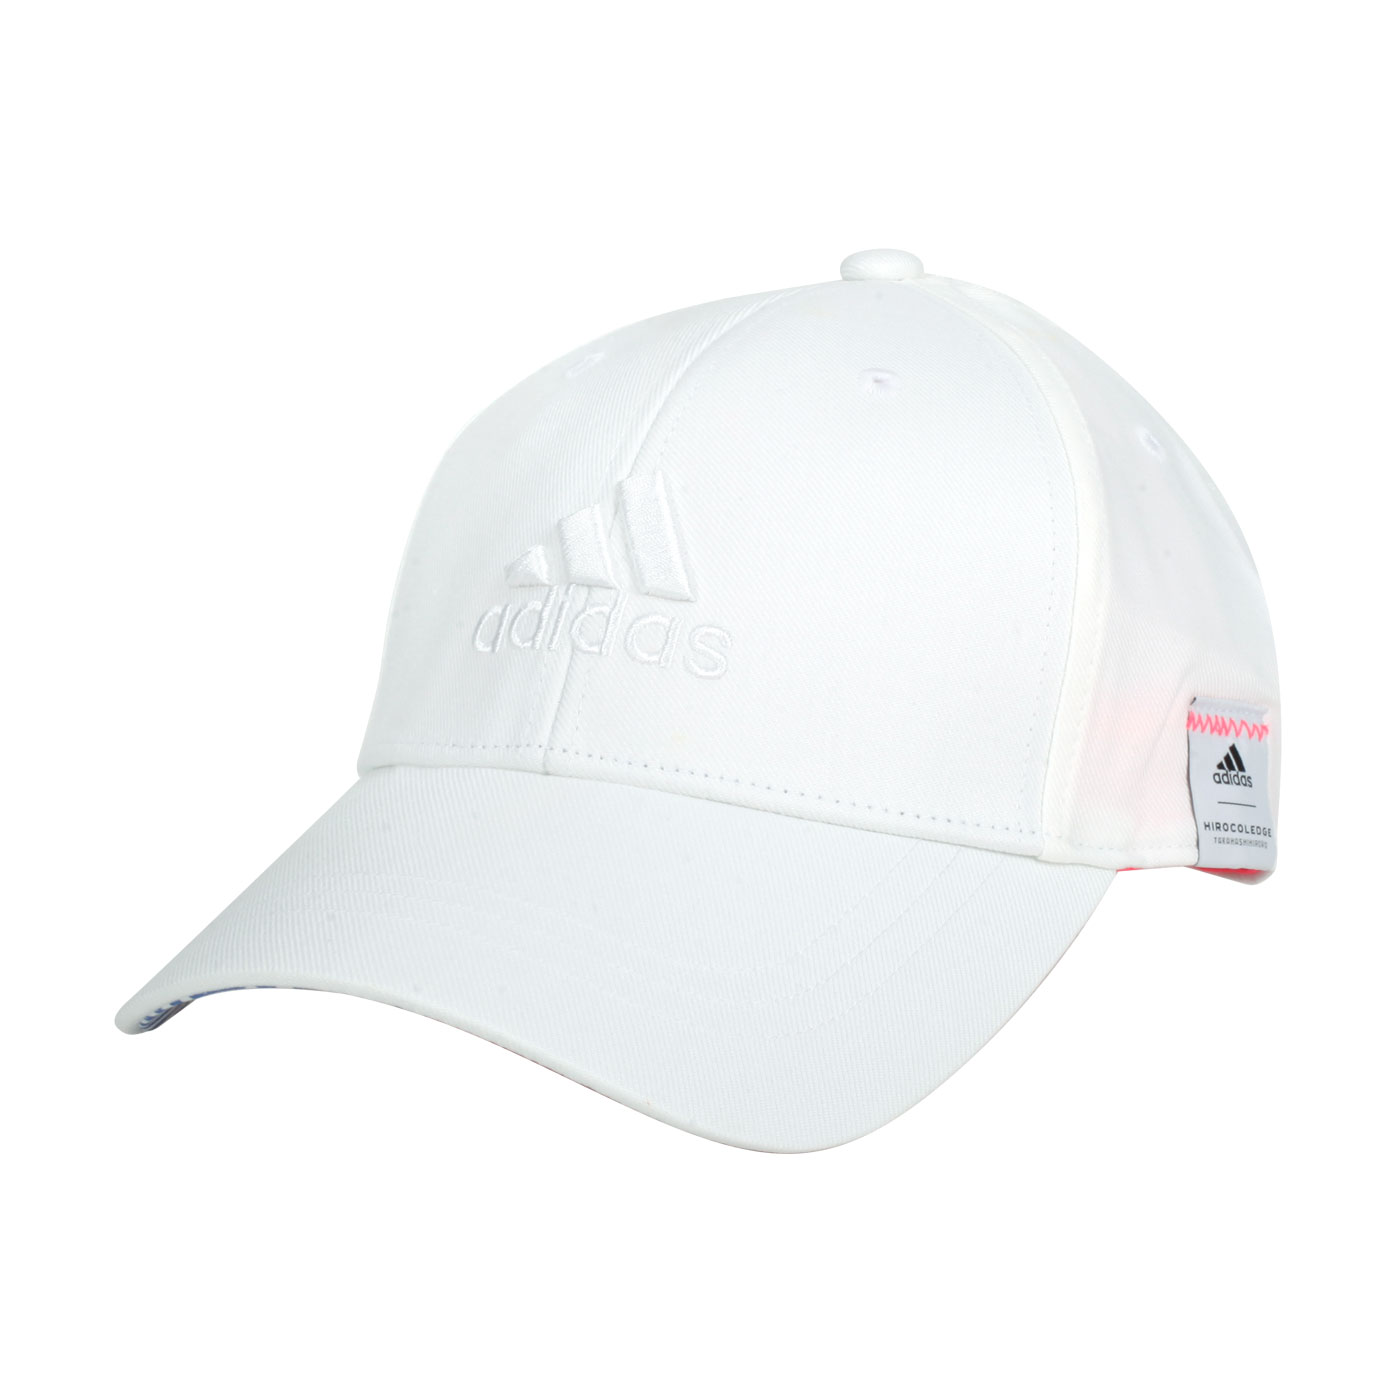 ADIDAS 帽子 GD4954